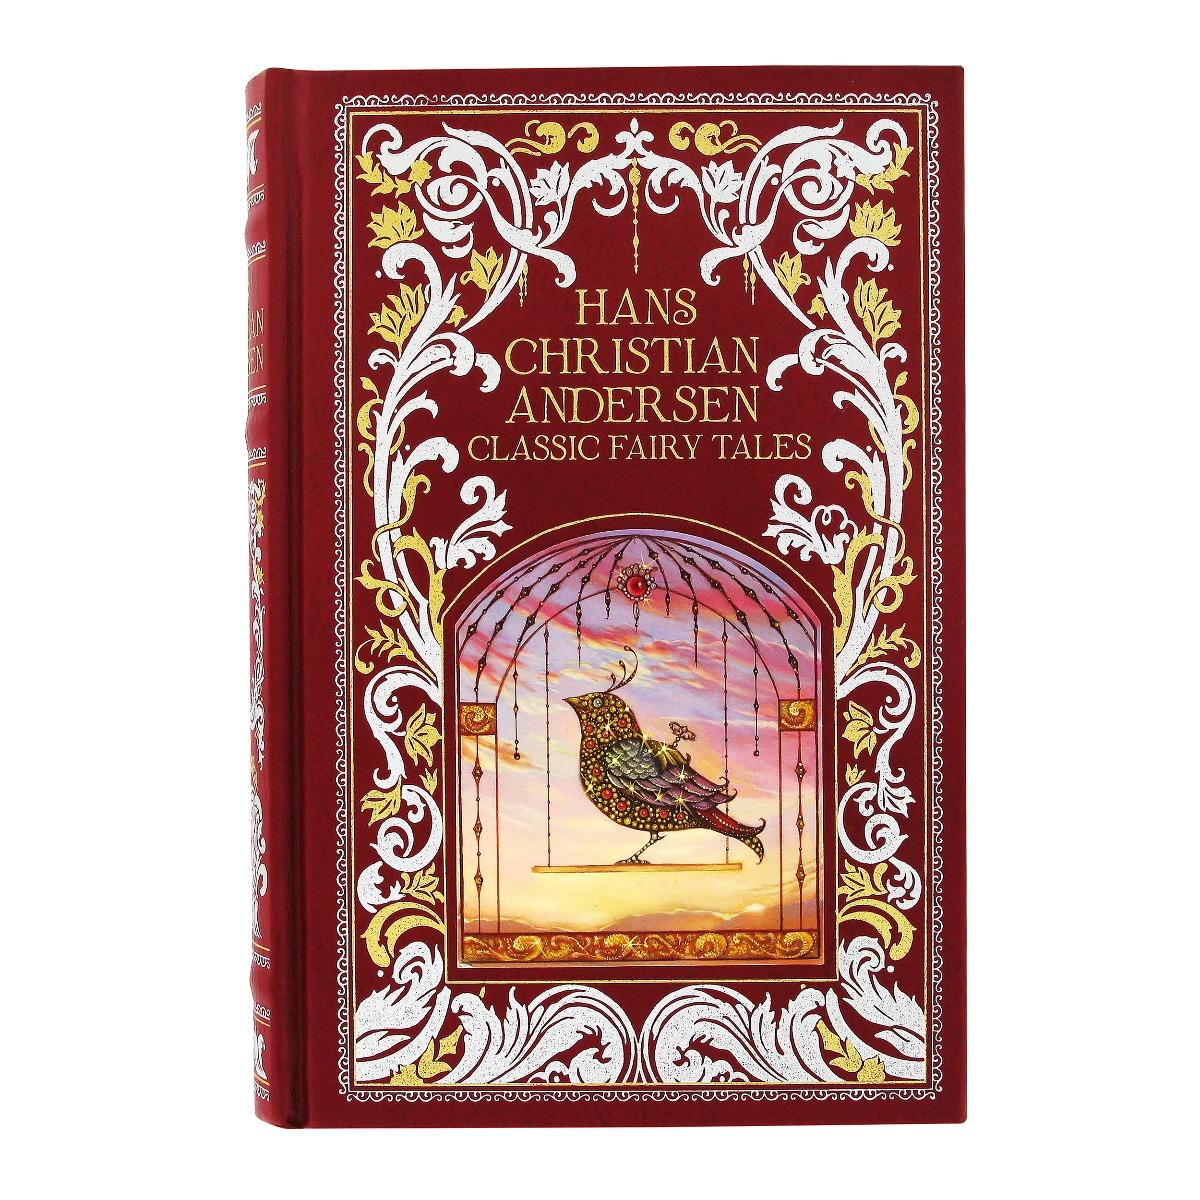 Hans Christian Andersen - Classic Fairy Tales